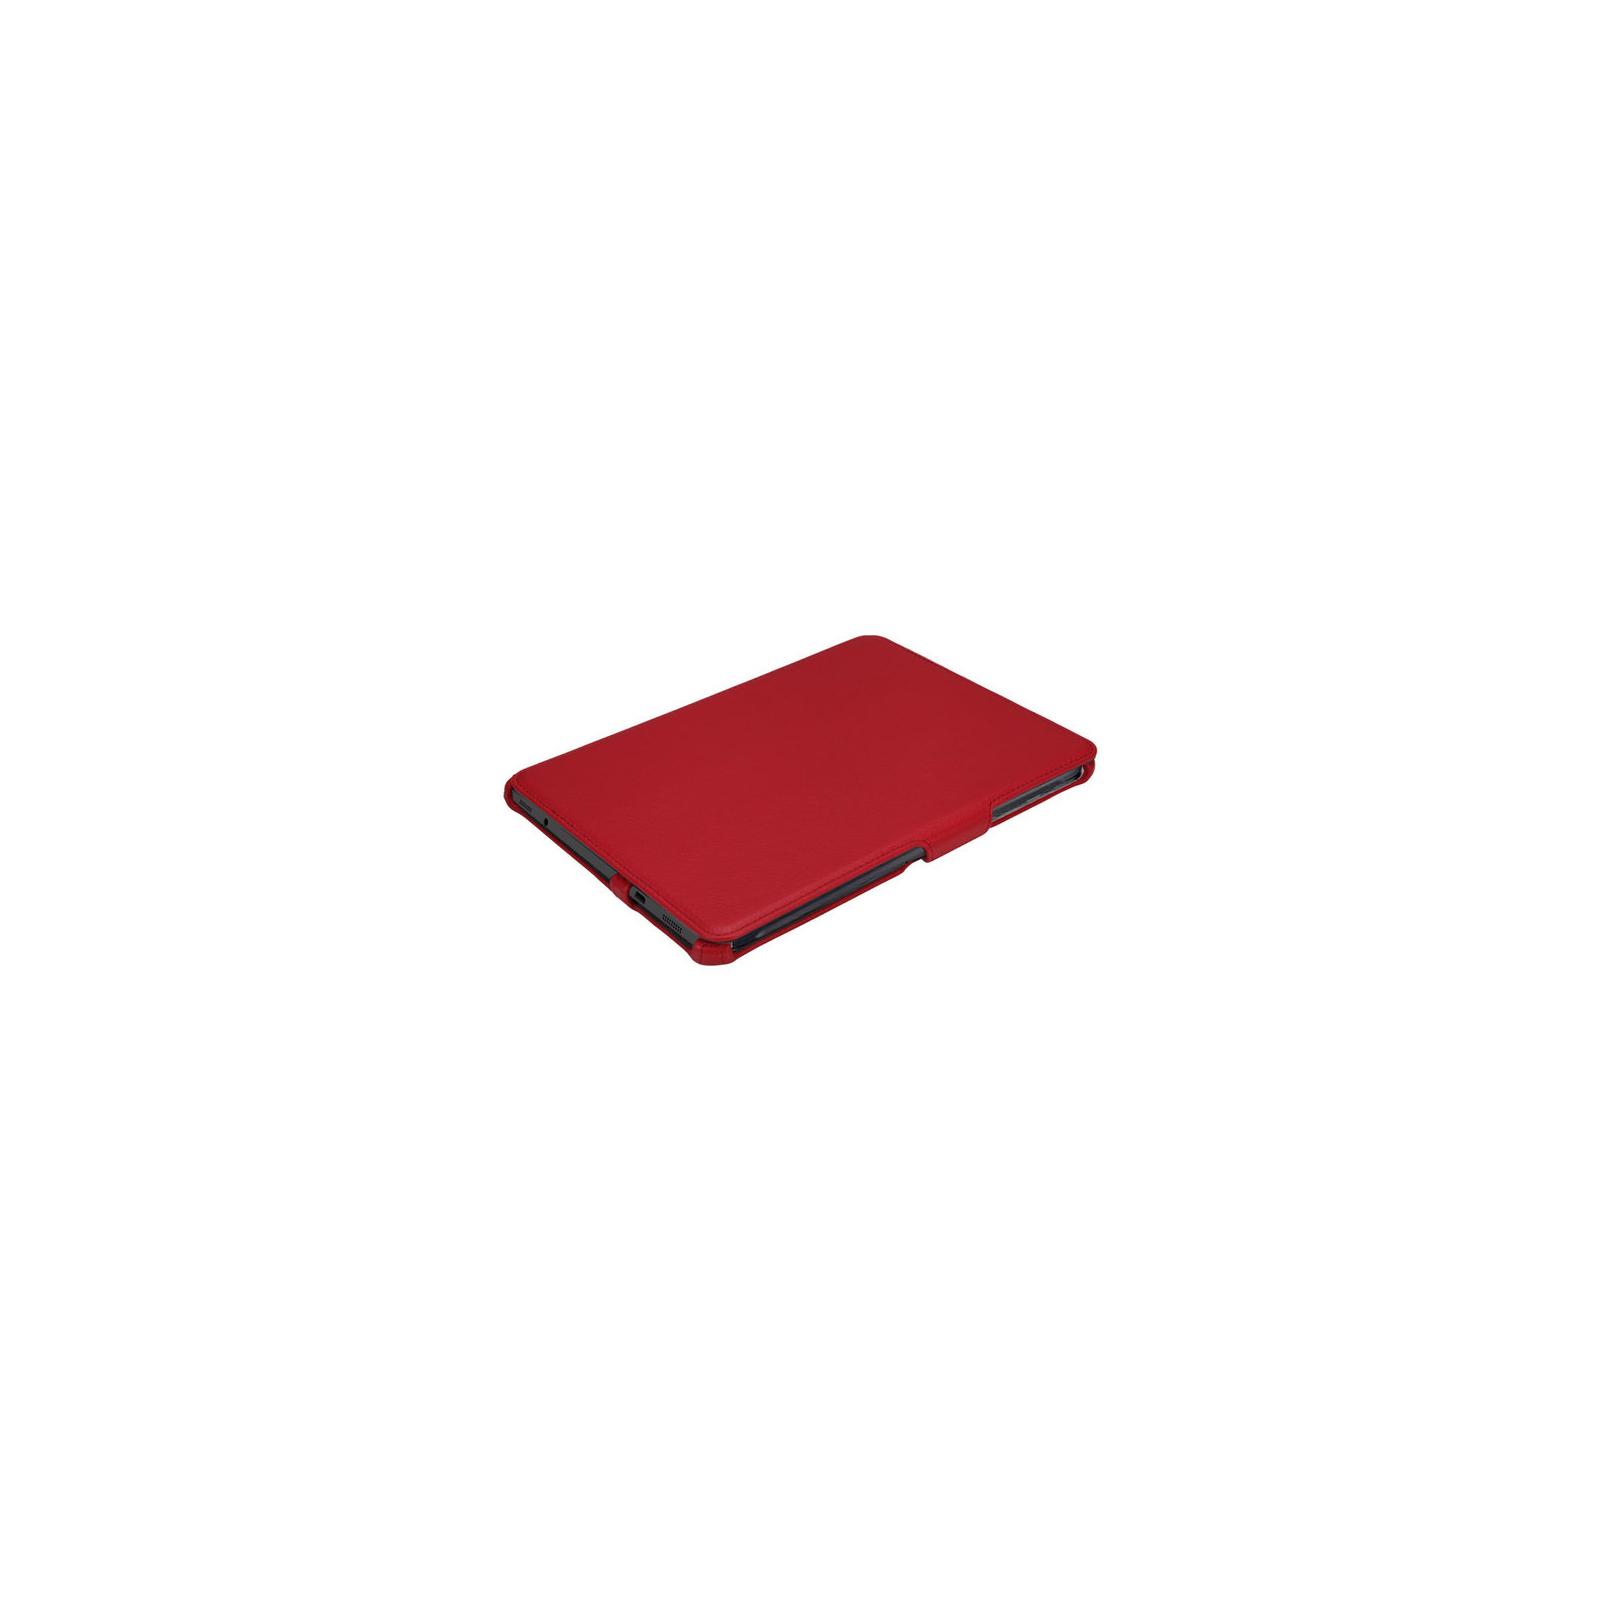 Чехол для планшета AirOn для Samsung Galaxy Tab S 2 8.0 red (4822352777524) изображение 3